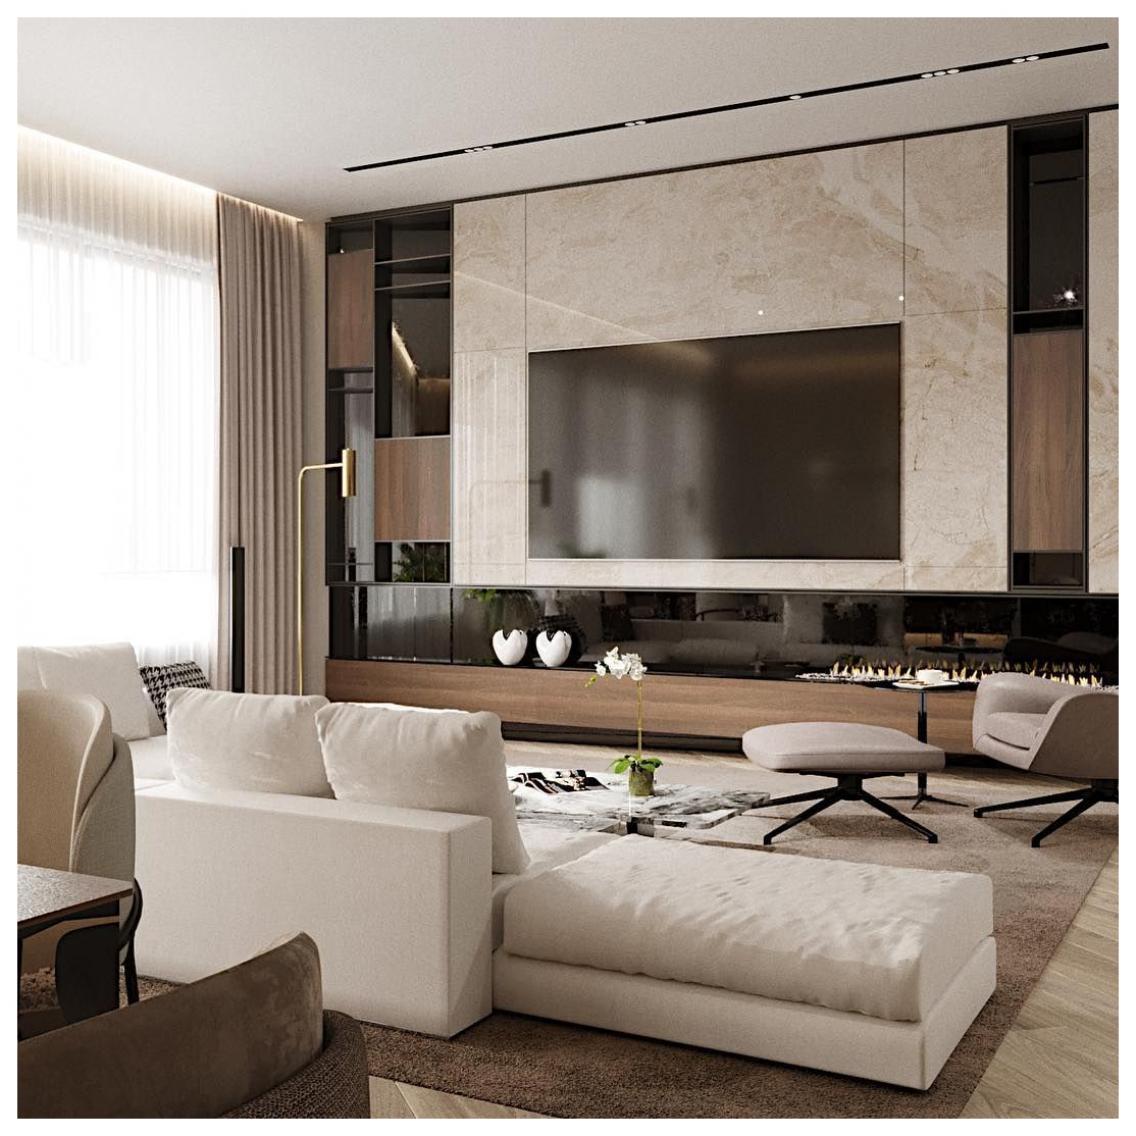 Instagram tv unit design modern luxury # in 2020 | Living ...